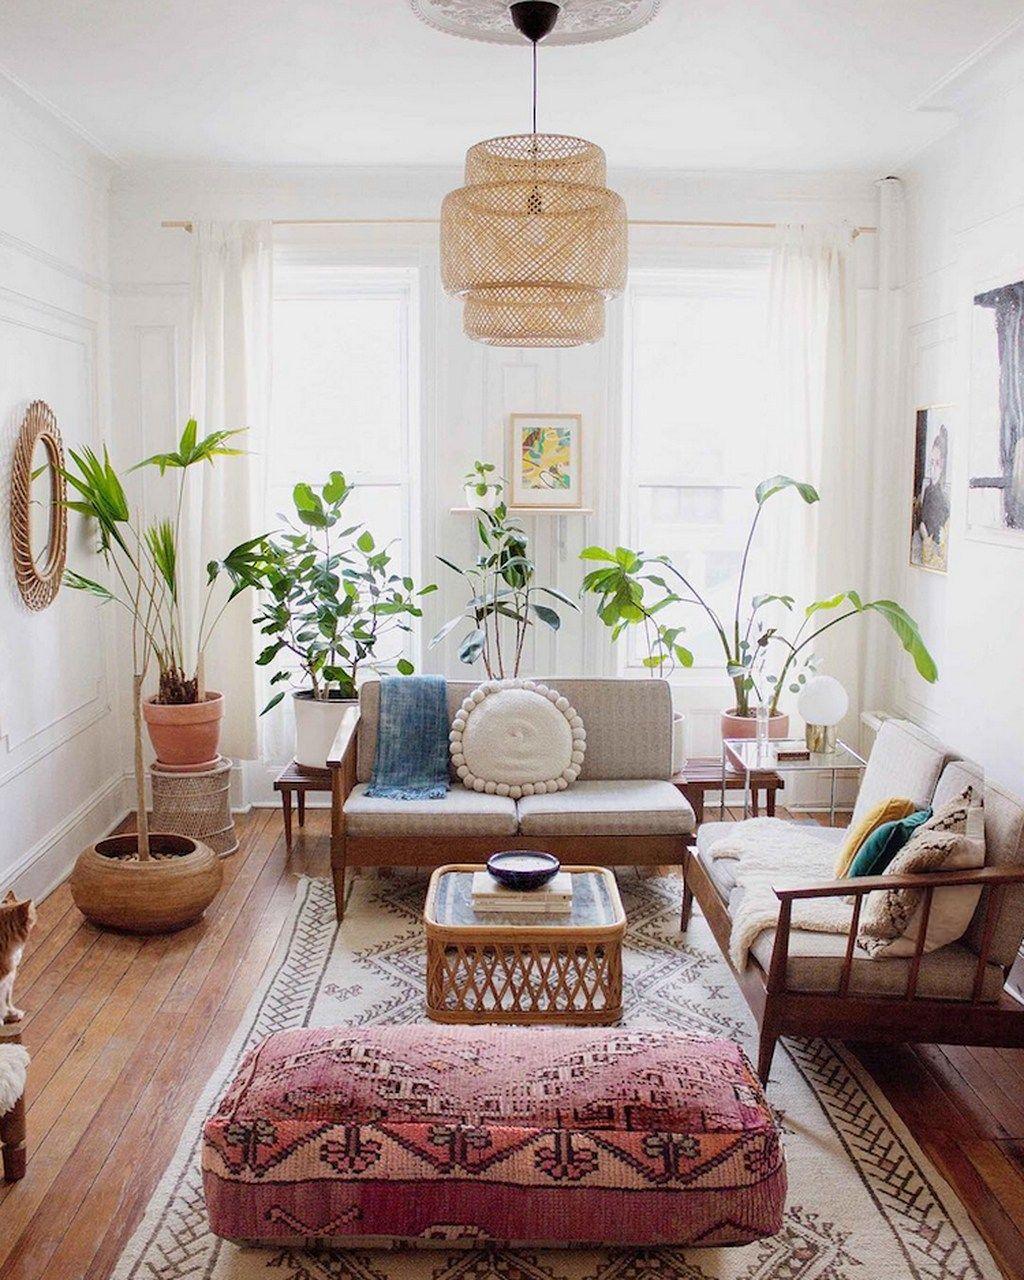 34 Awesome Farmhemian Decor Ideas To Apply Now | Boho chic ... on Bohemian Living Room Decor Ideas  id=63801